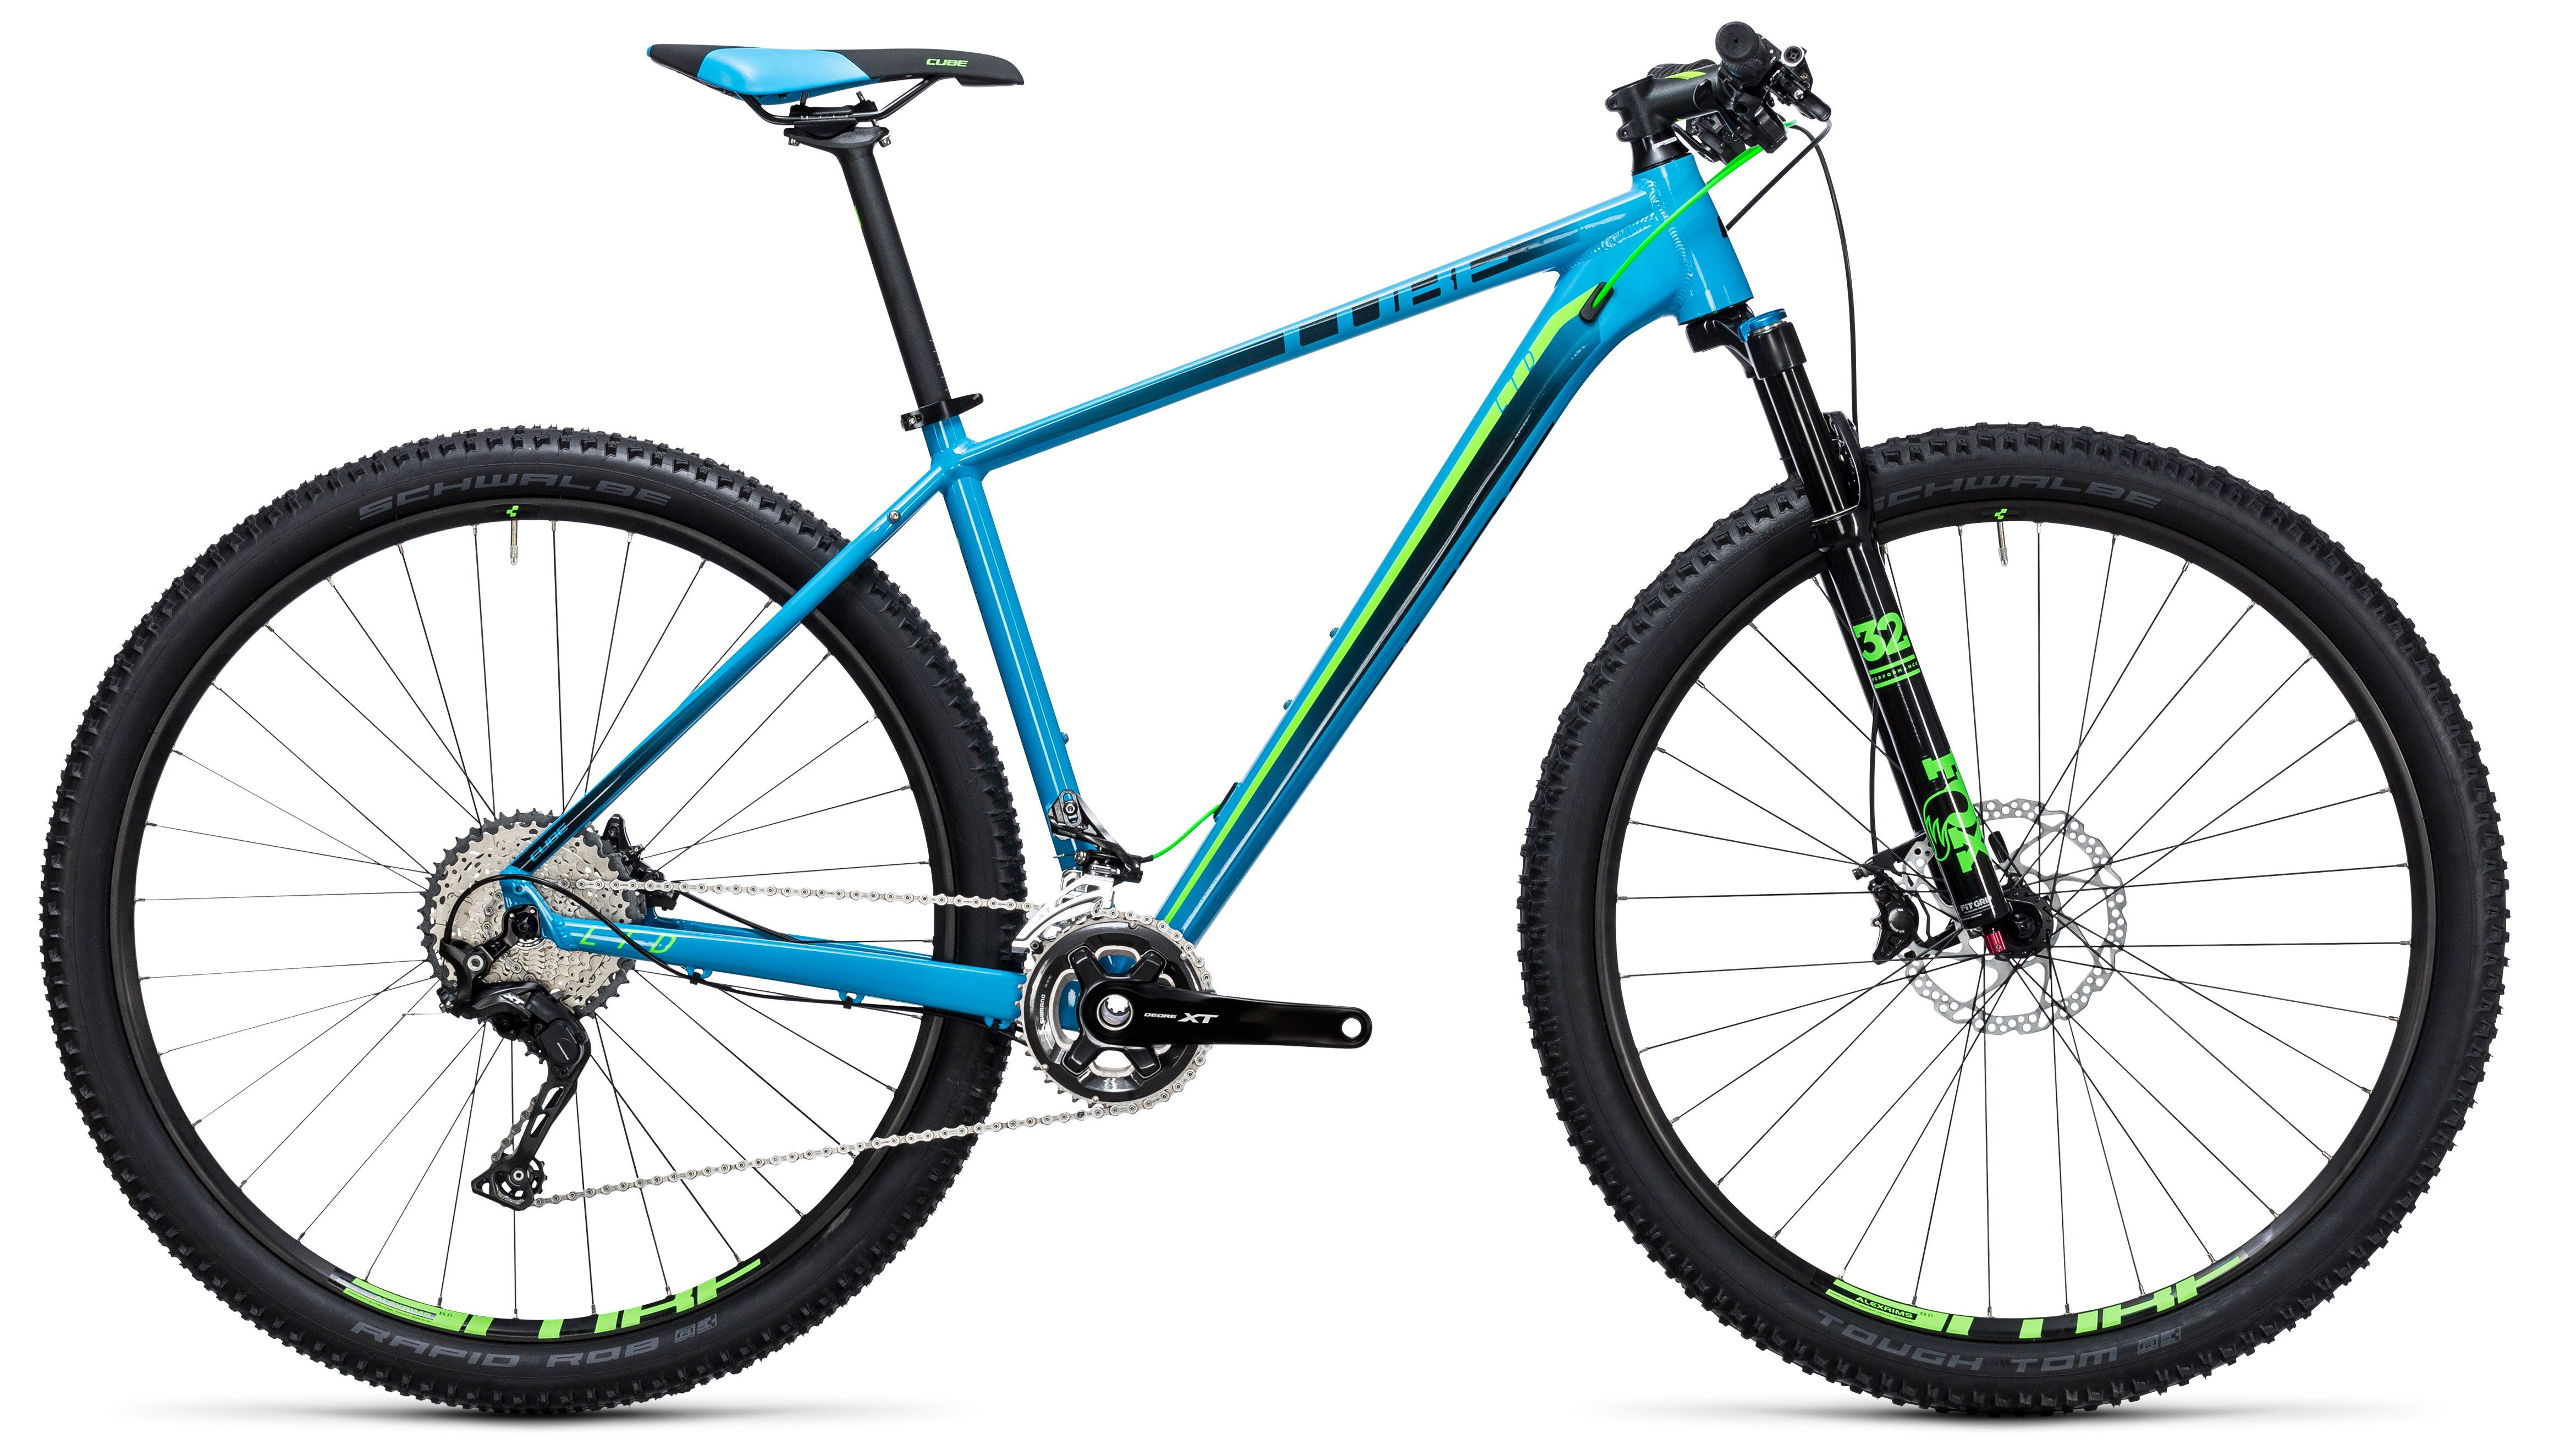 Велосипед Cube LTD SL 27.5 2017,  Горные  - артикул:272972